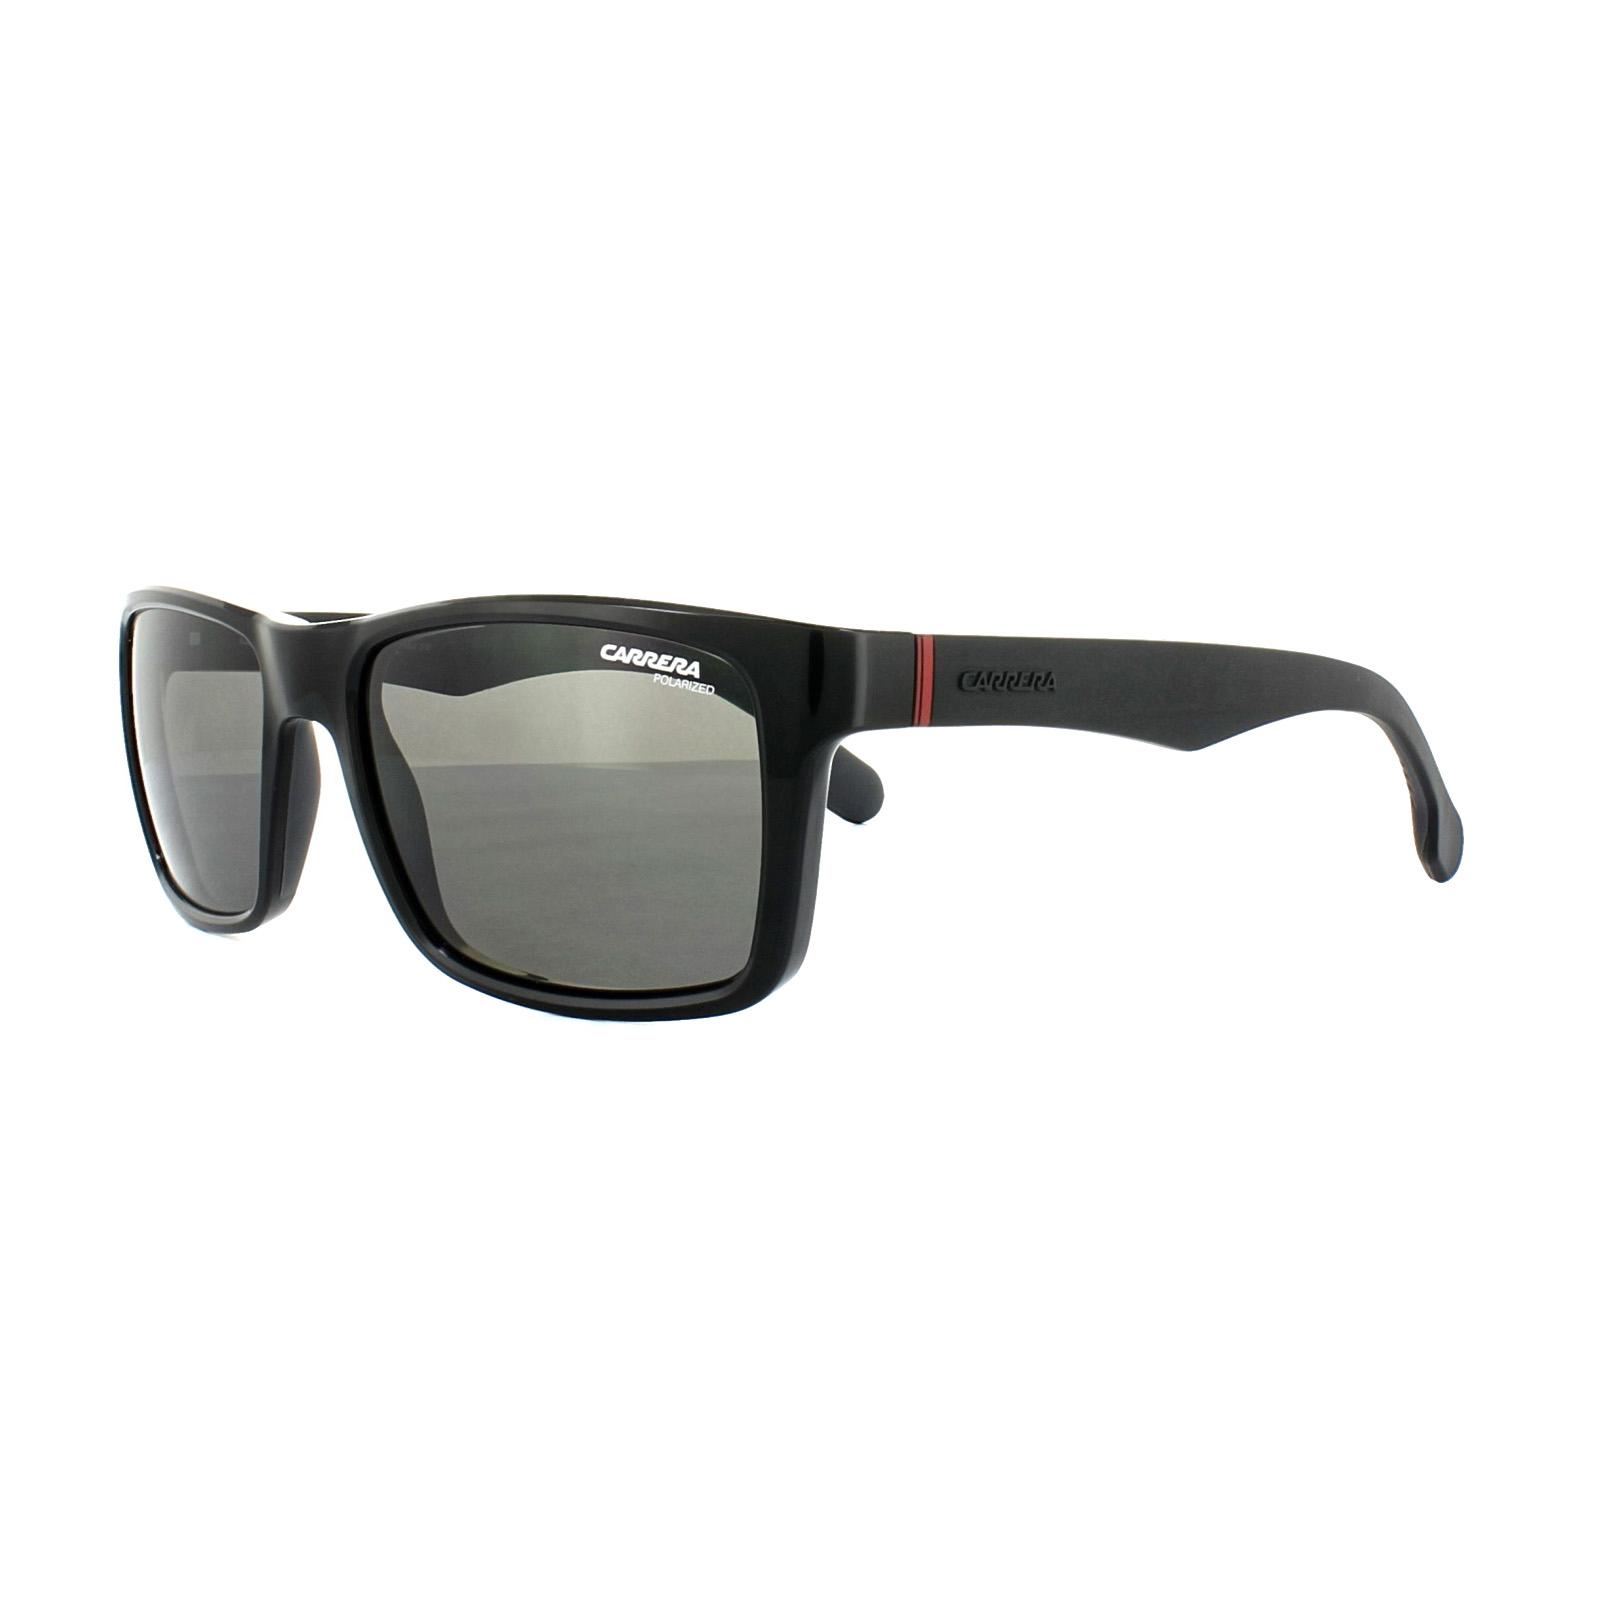 f7e87cd94f41 Sentinel Carrera Sunglasses 8024/L/S 807 M9 Black Grey Polarized 57mm